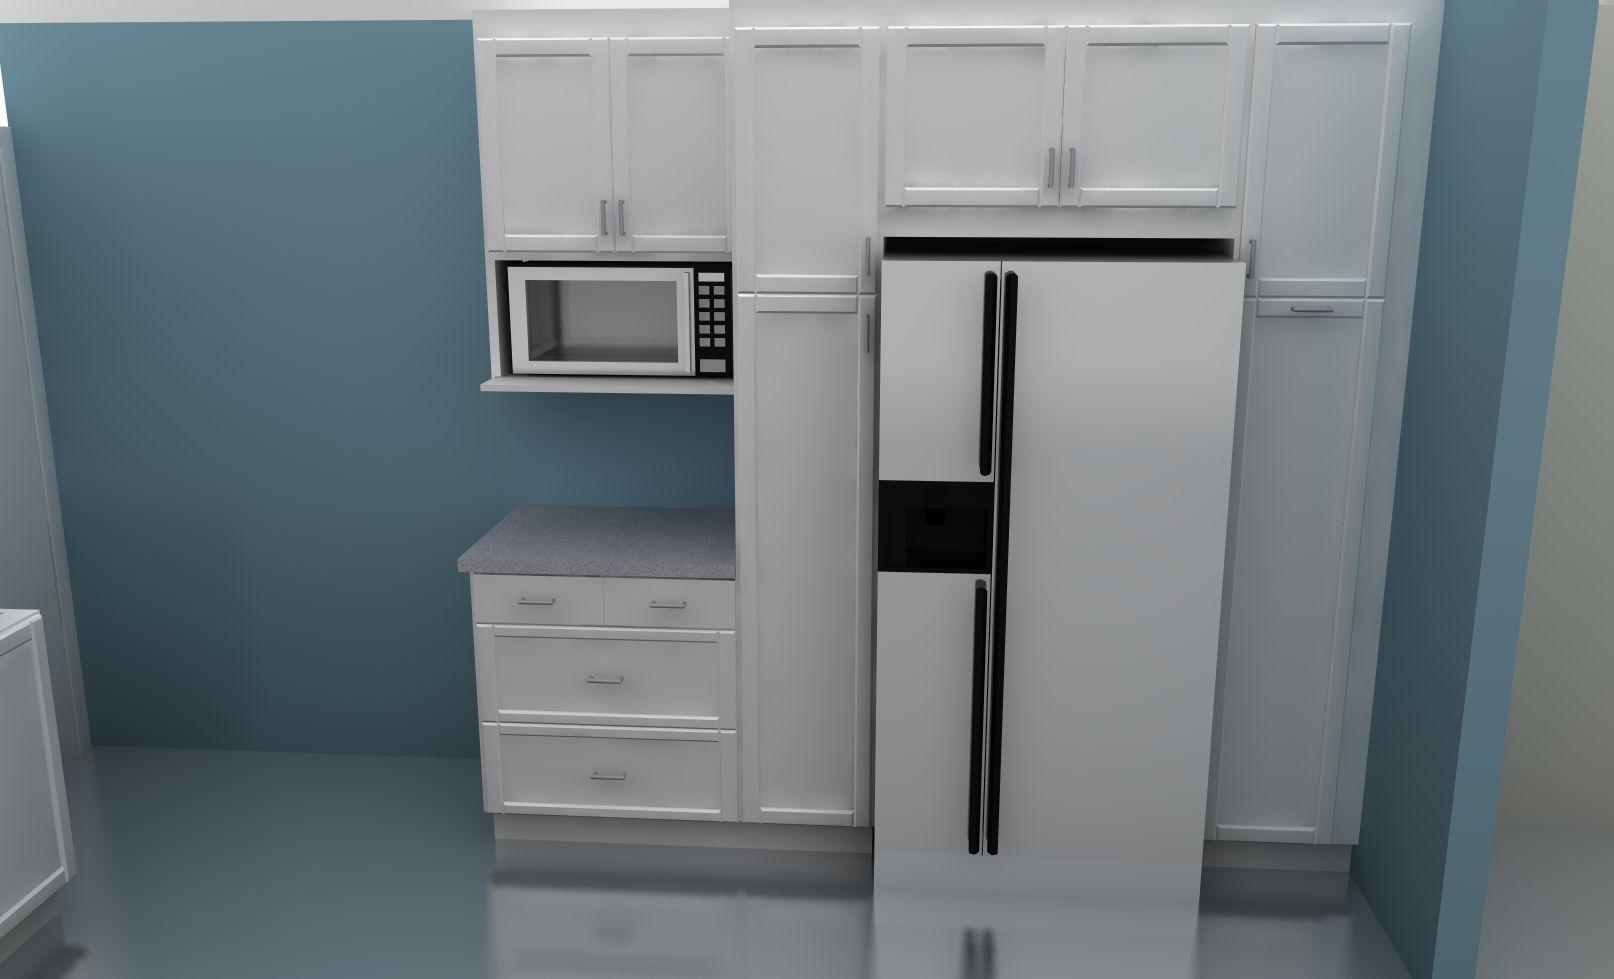 Fridge Idea Tall Kitchen Cabinets Kitchen Pantry Cabinet